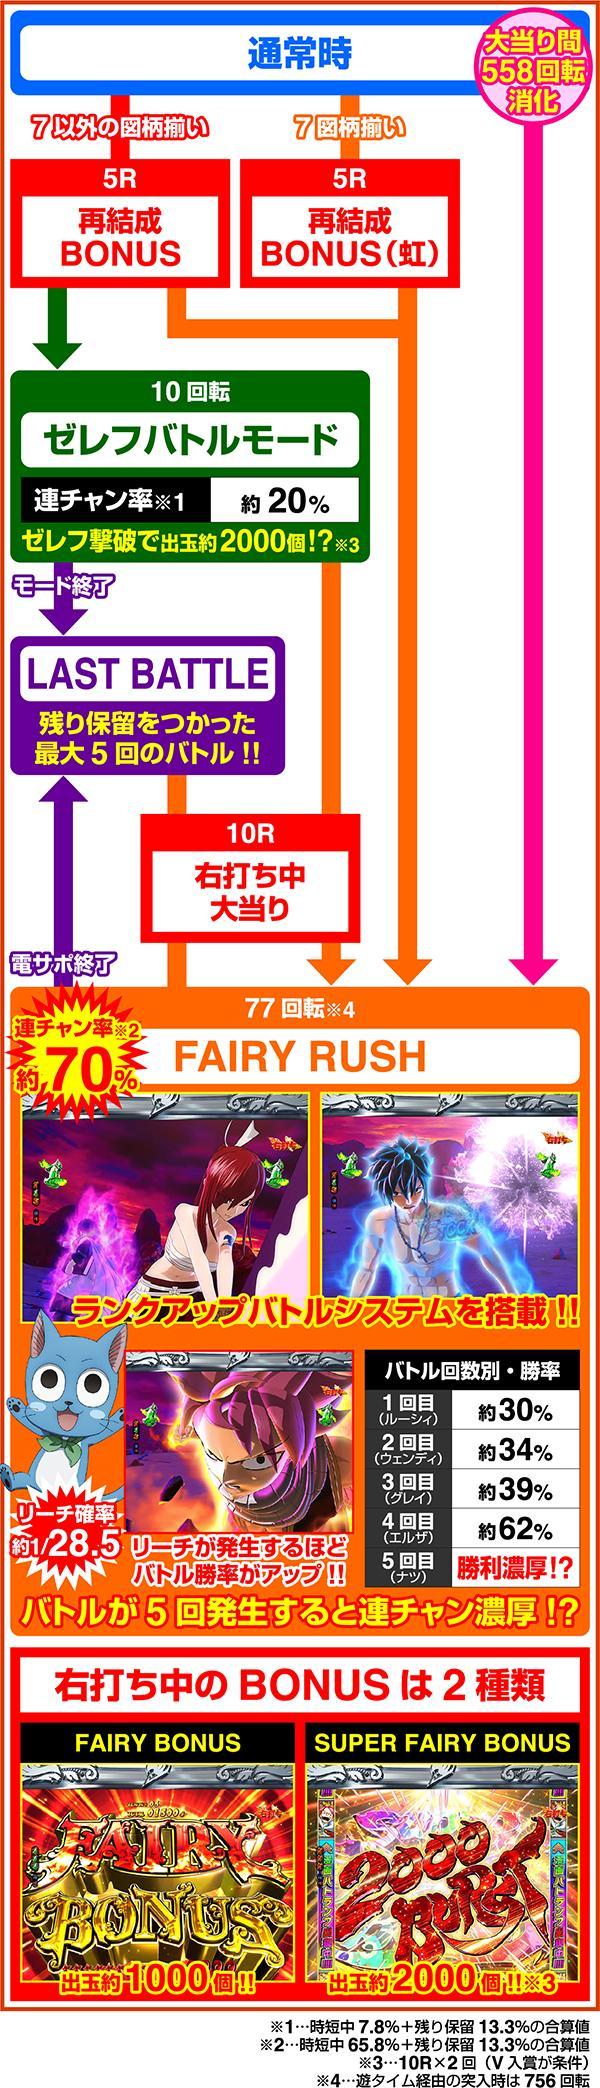 P FAIRY TAIL2 JQD 藤商事 ゲームフロー